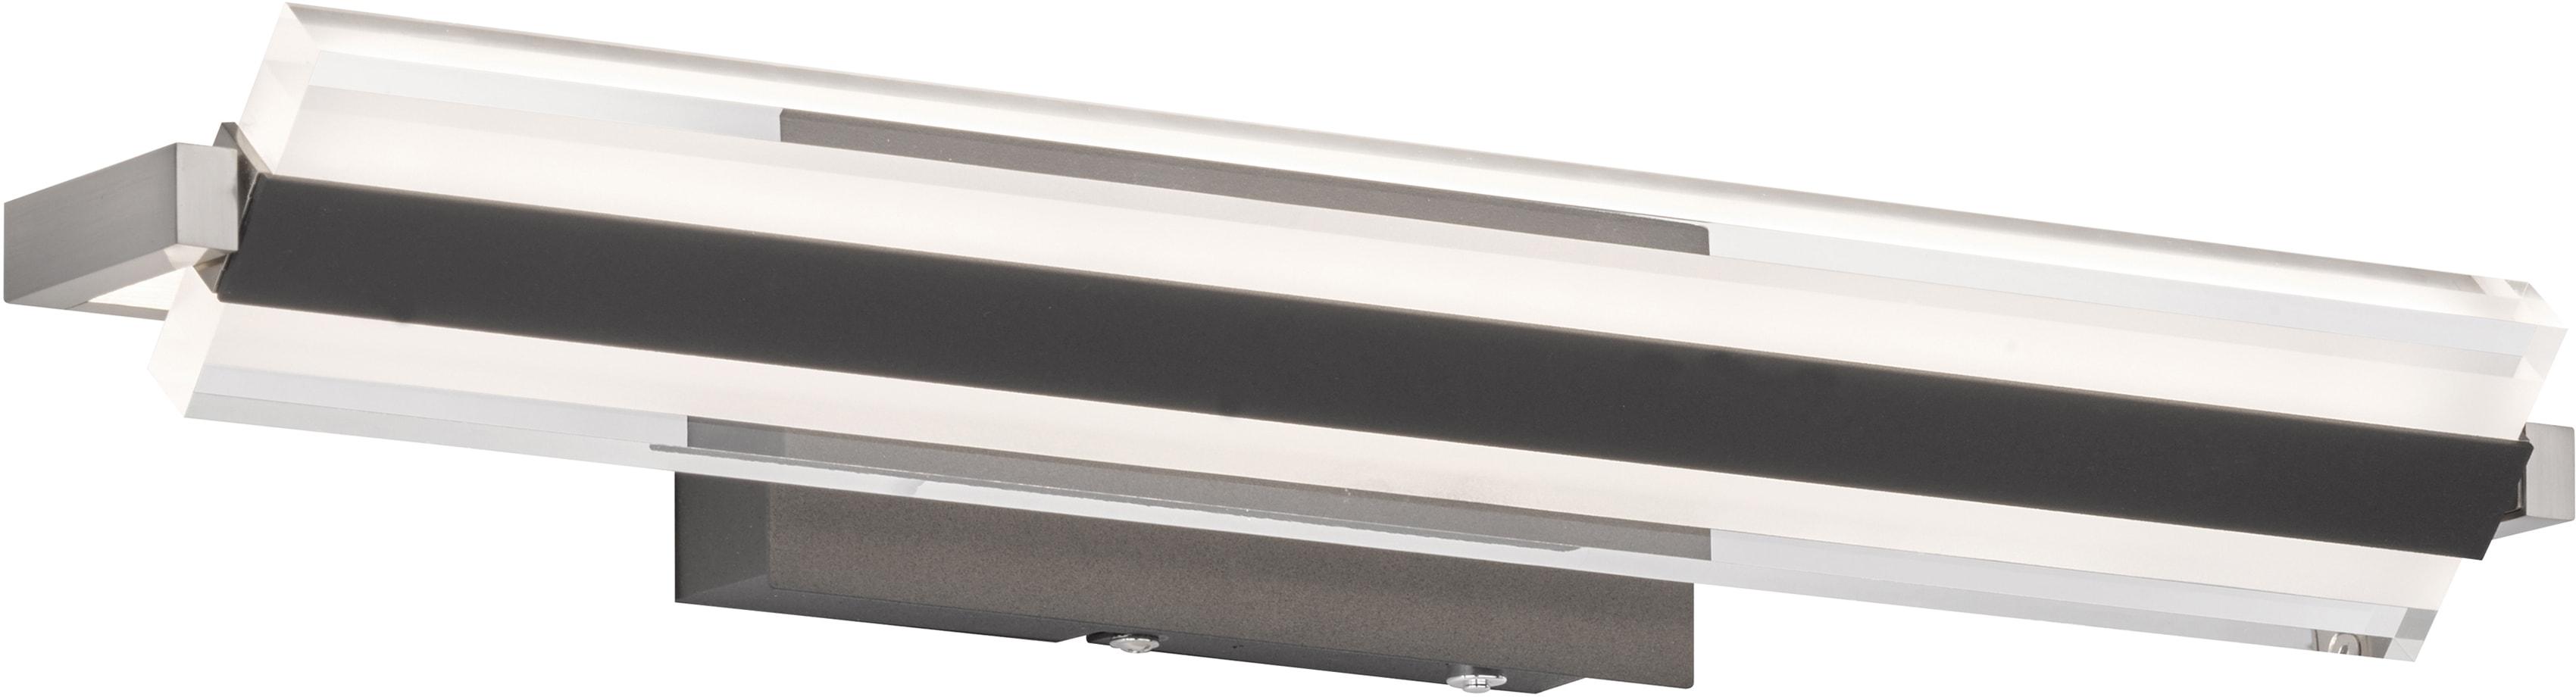 FISCHER & HONSEL LED Wandleuchte Paros TW, LED-Modul, Warmweiß-Neutralweiß